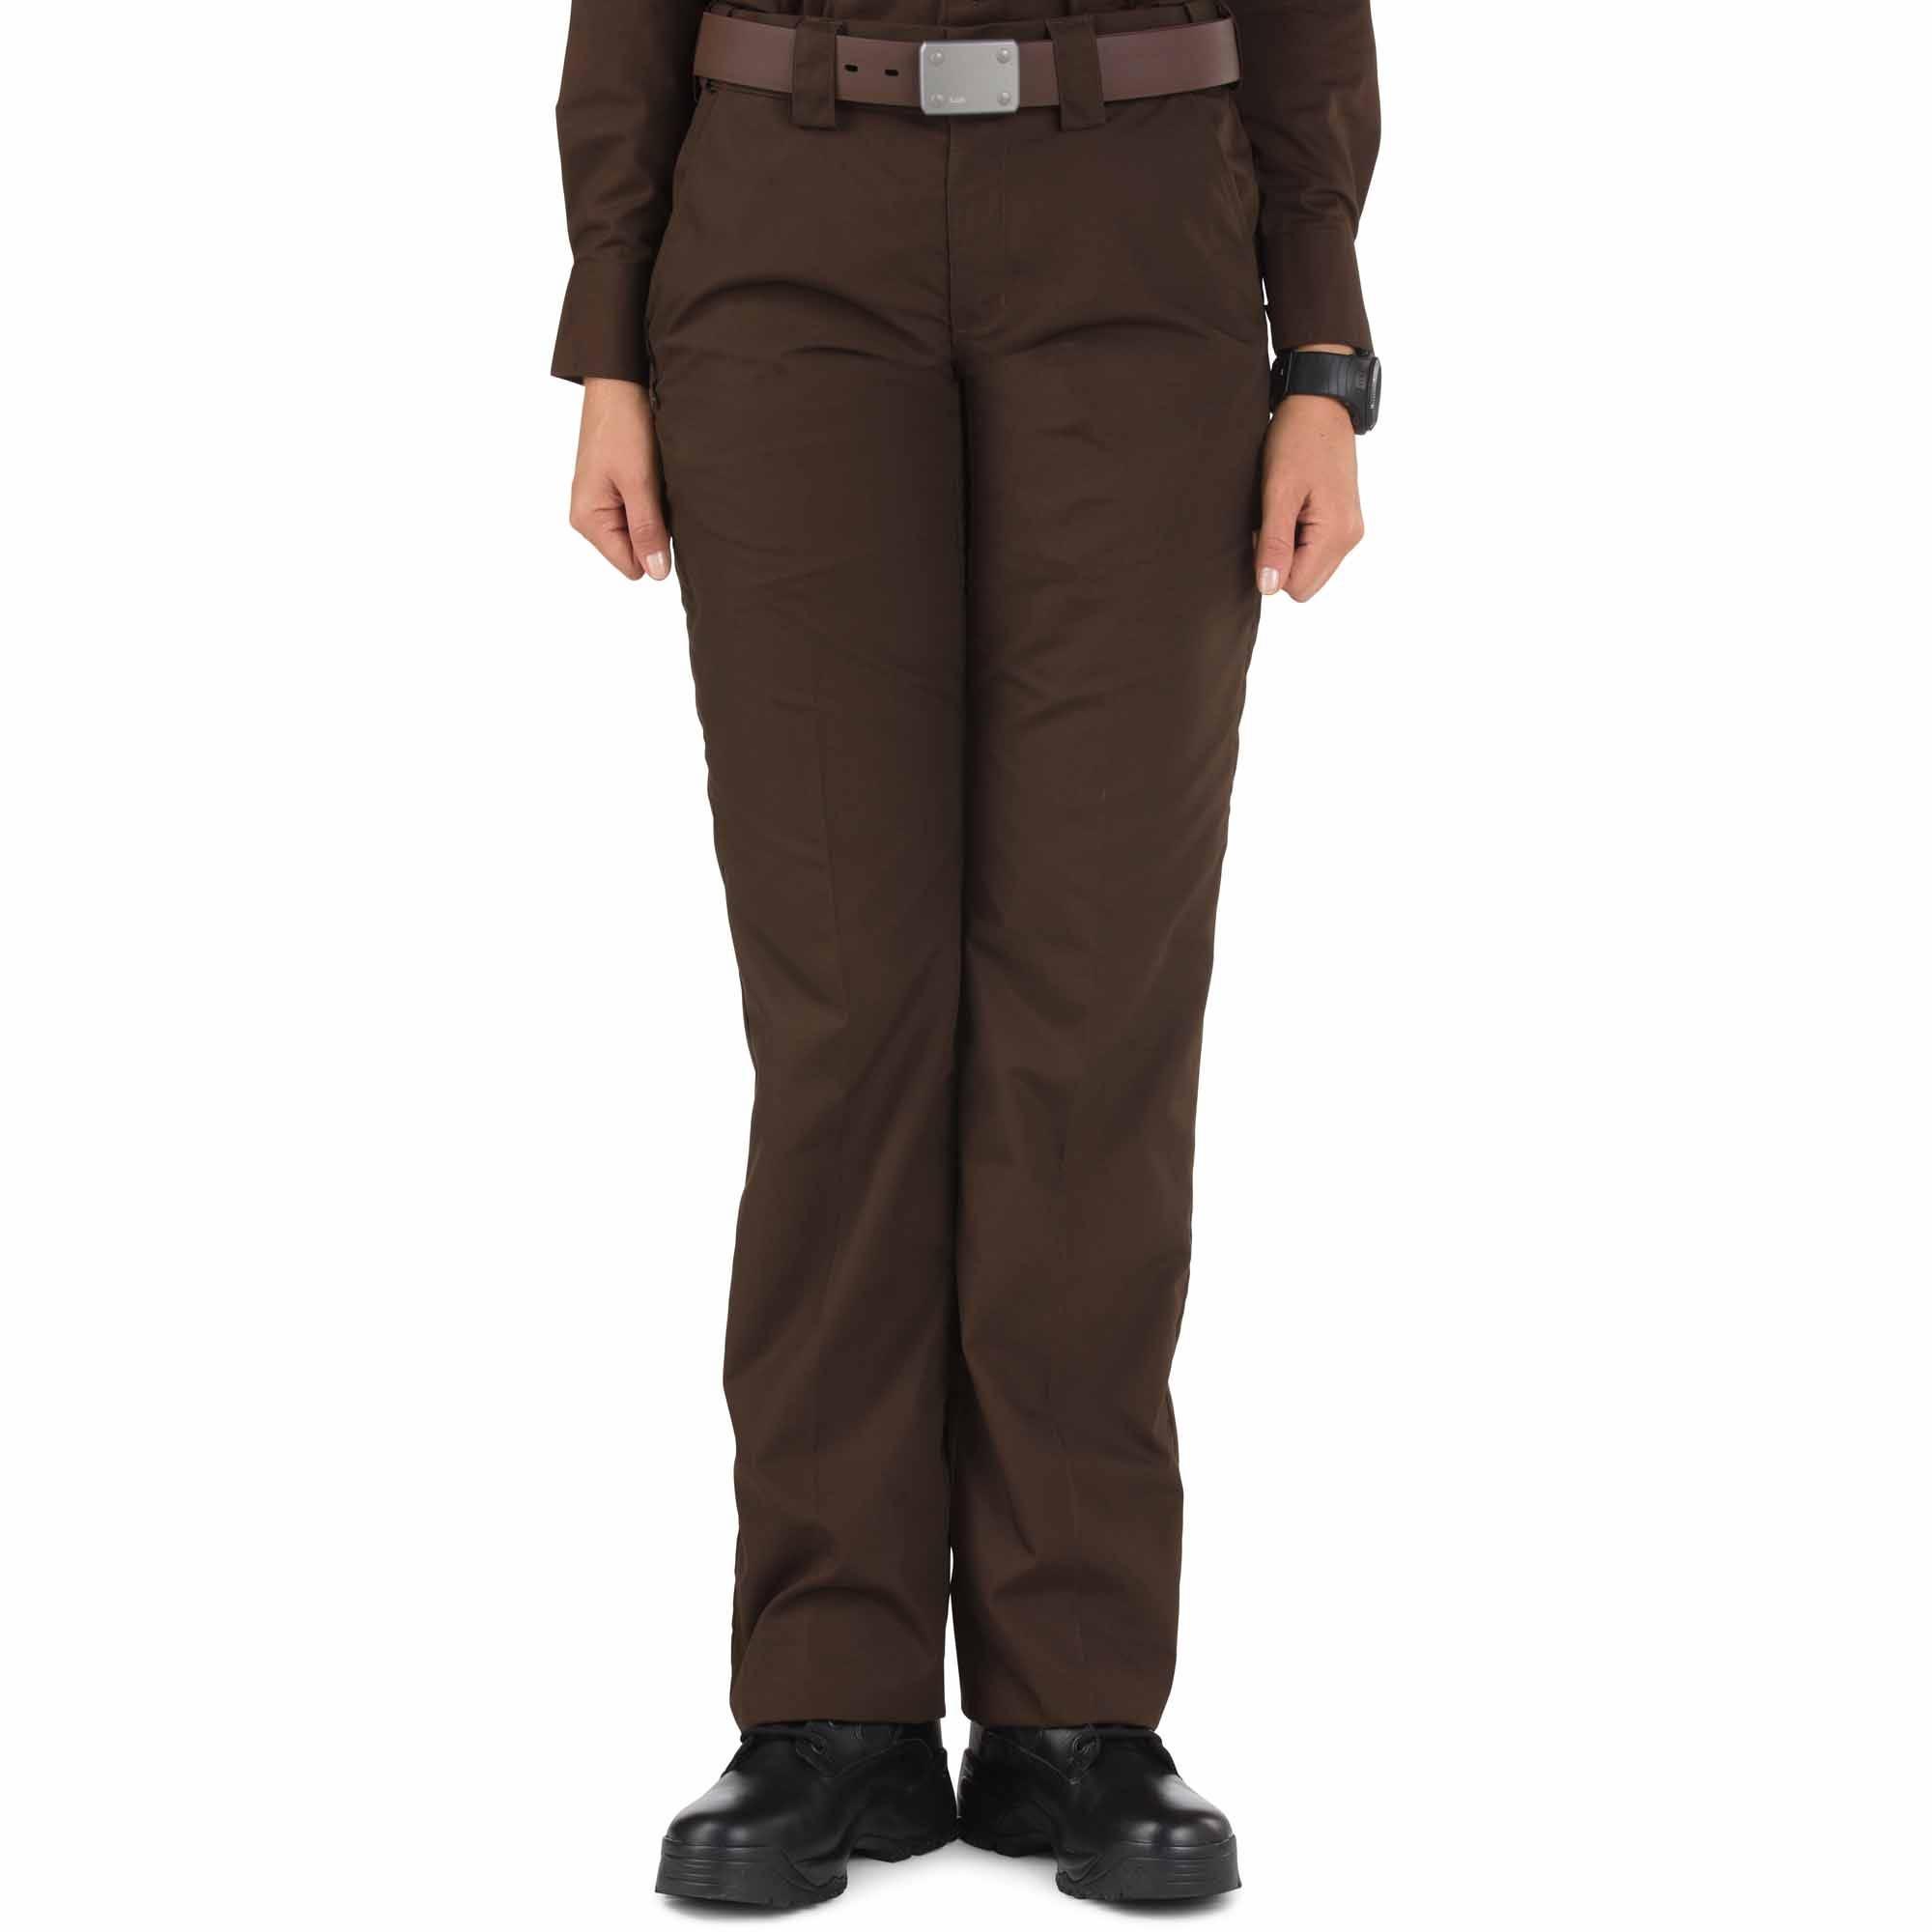 5.11 Tactical Taclite PDU Pants - A Class - Women's (Brown) thumbnail